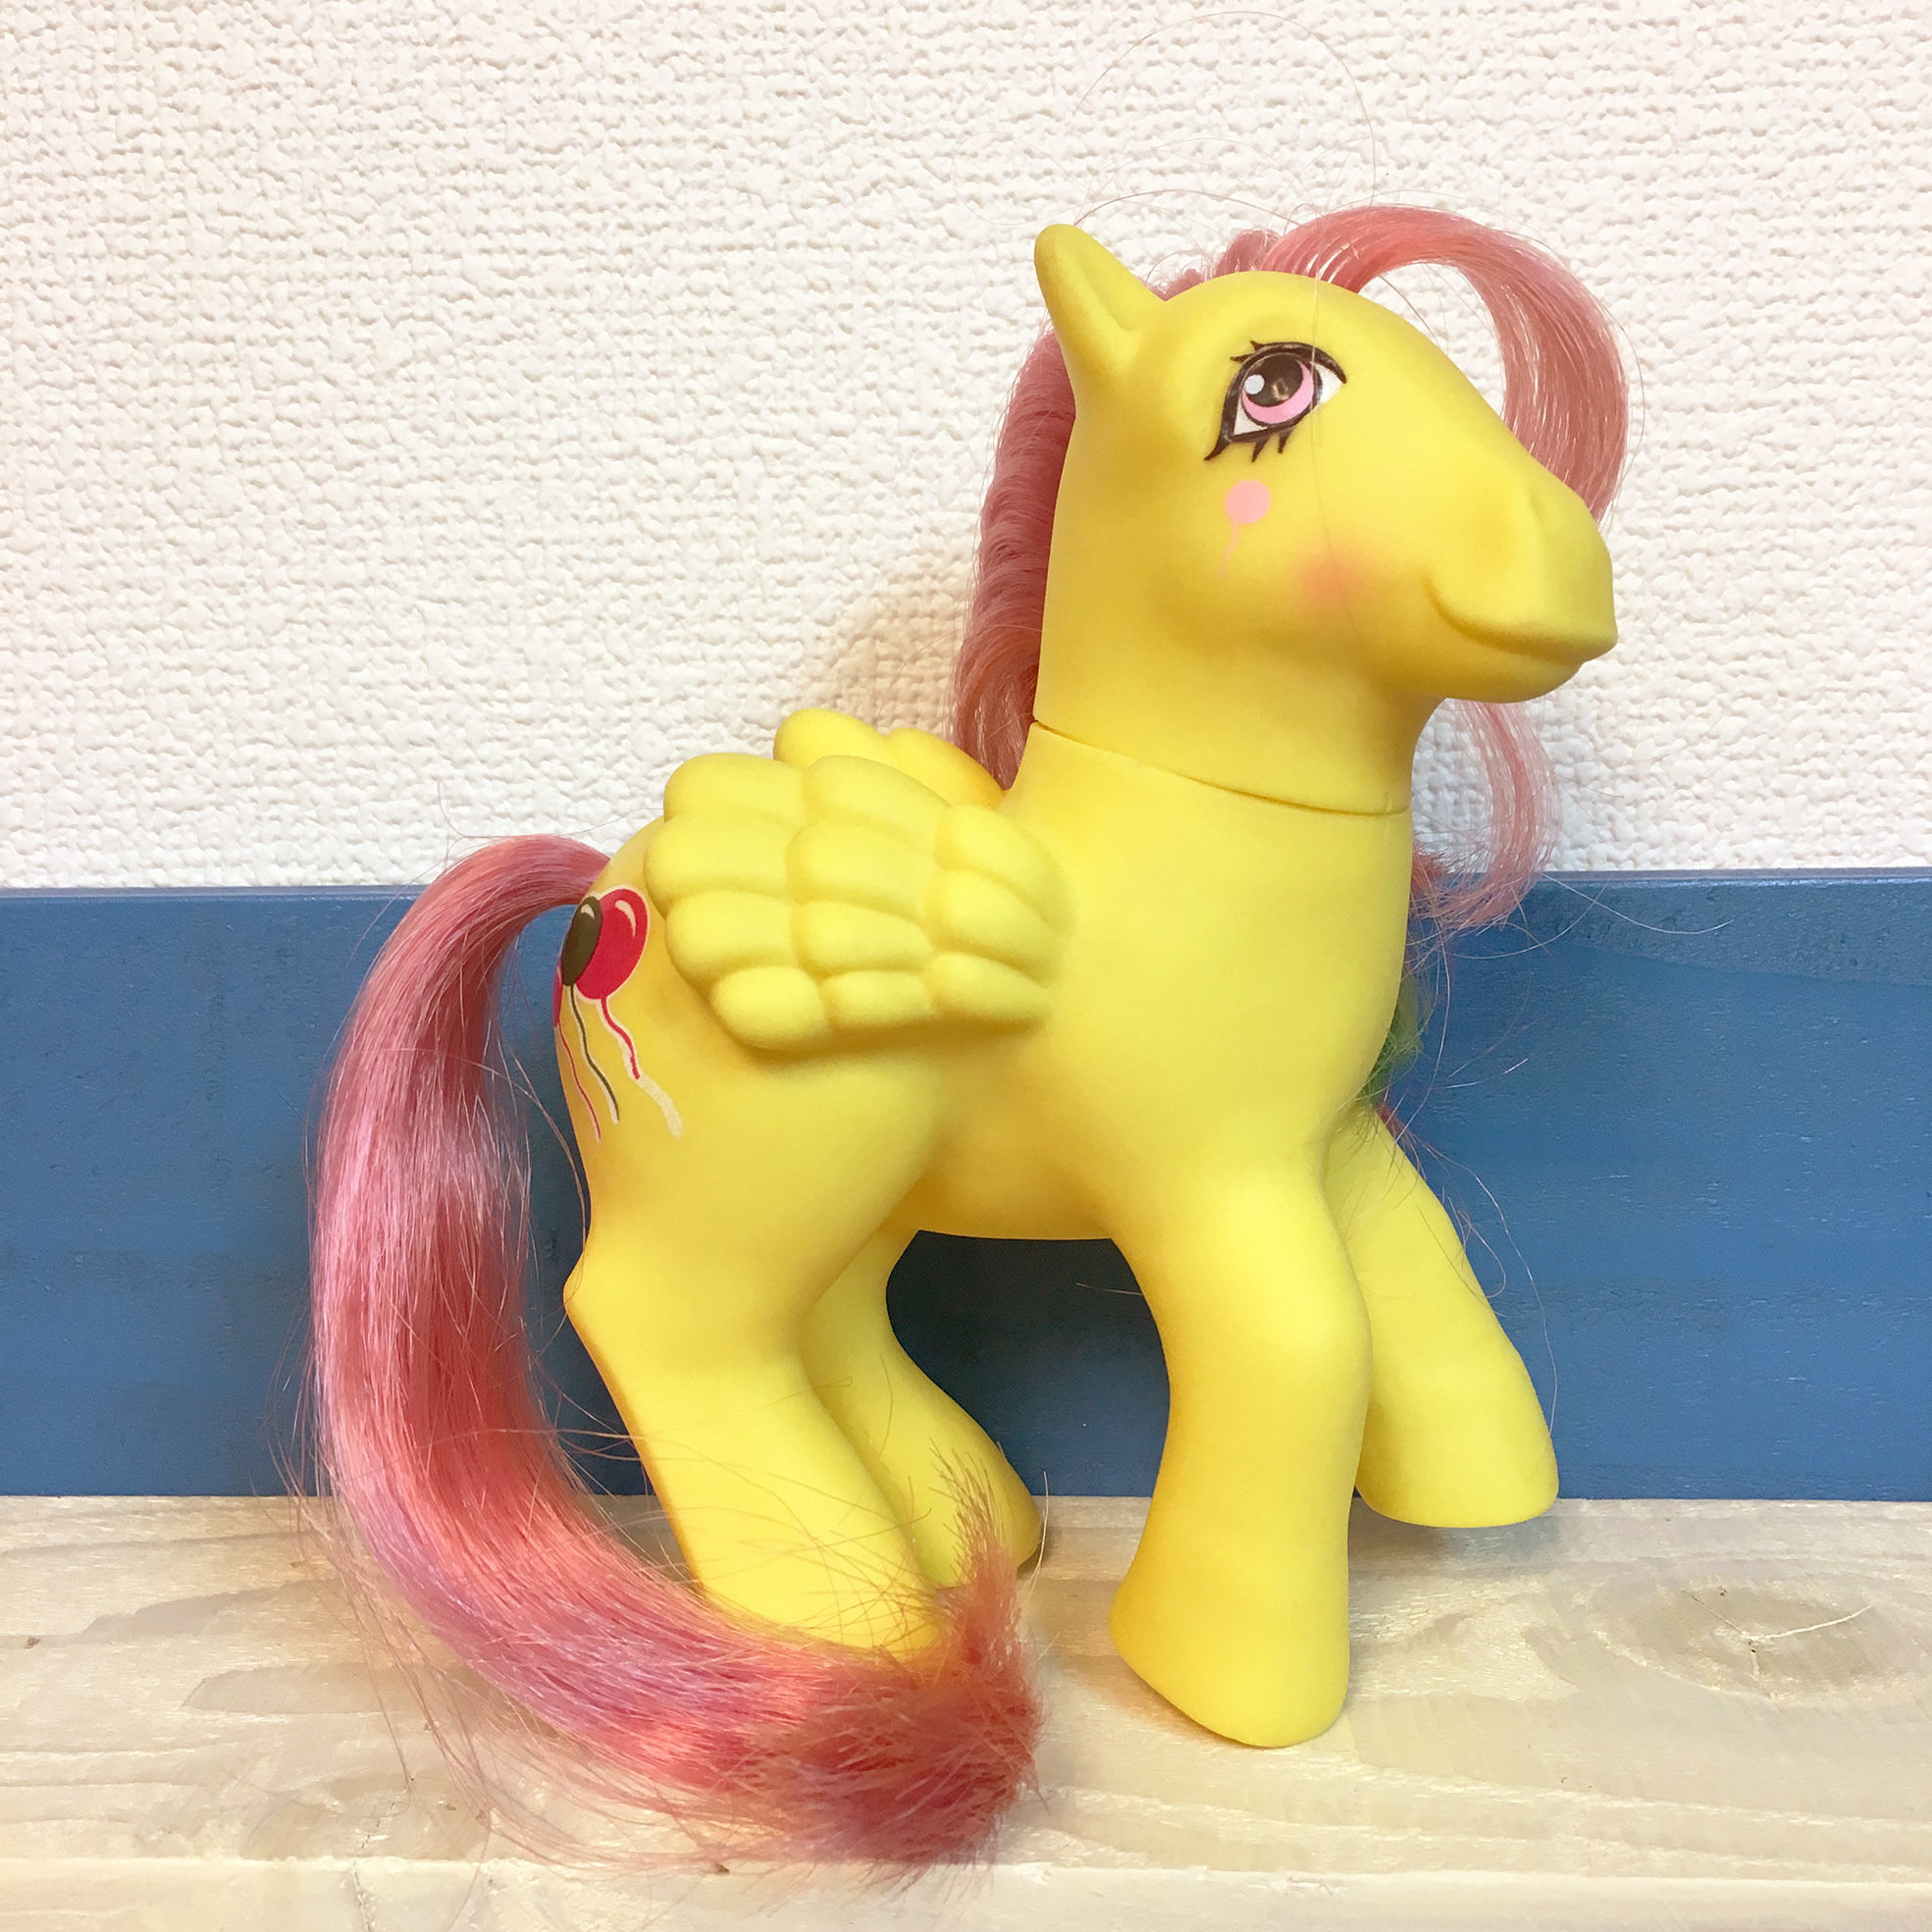 G1 My Little Pony Floater/G1マイリトルポニー フローター/171103-7